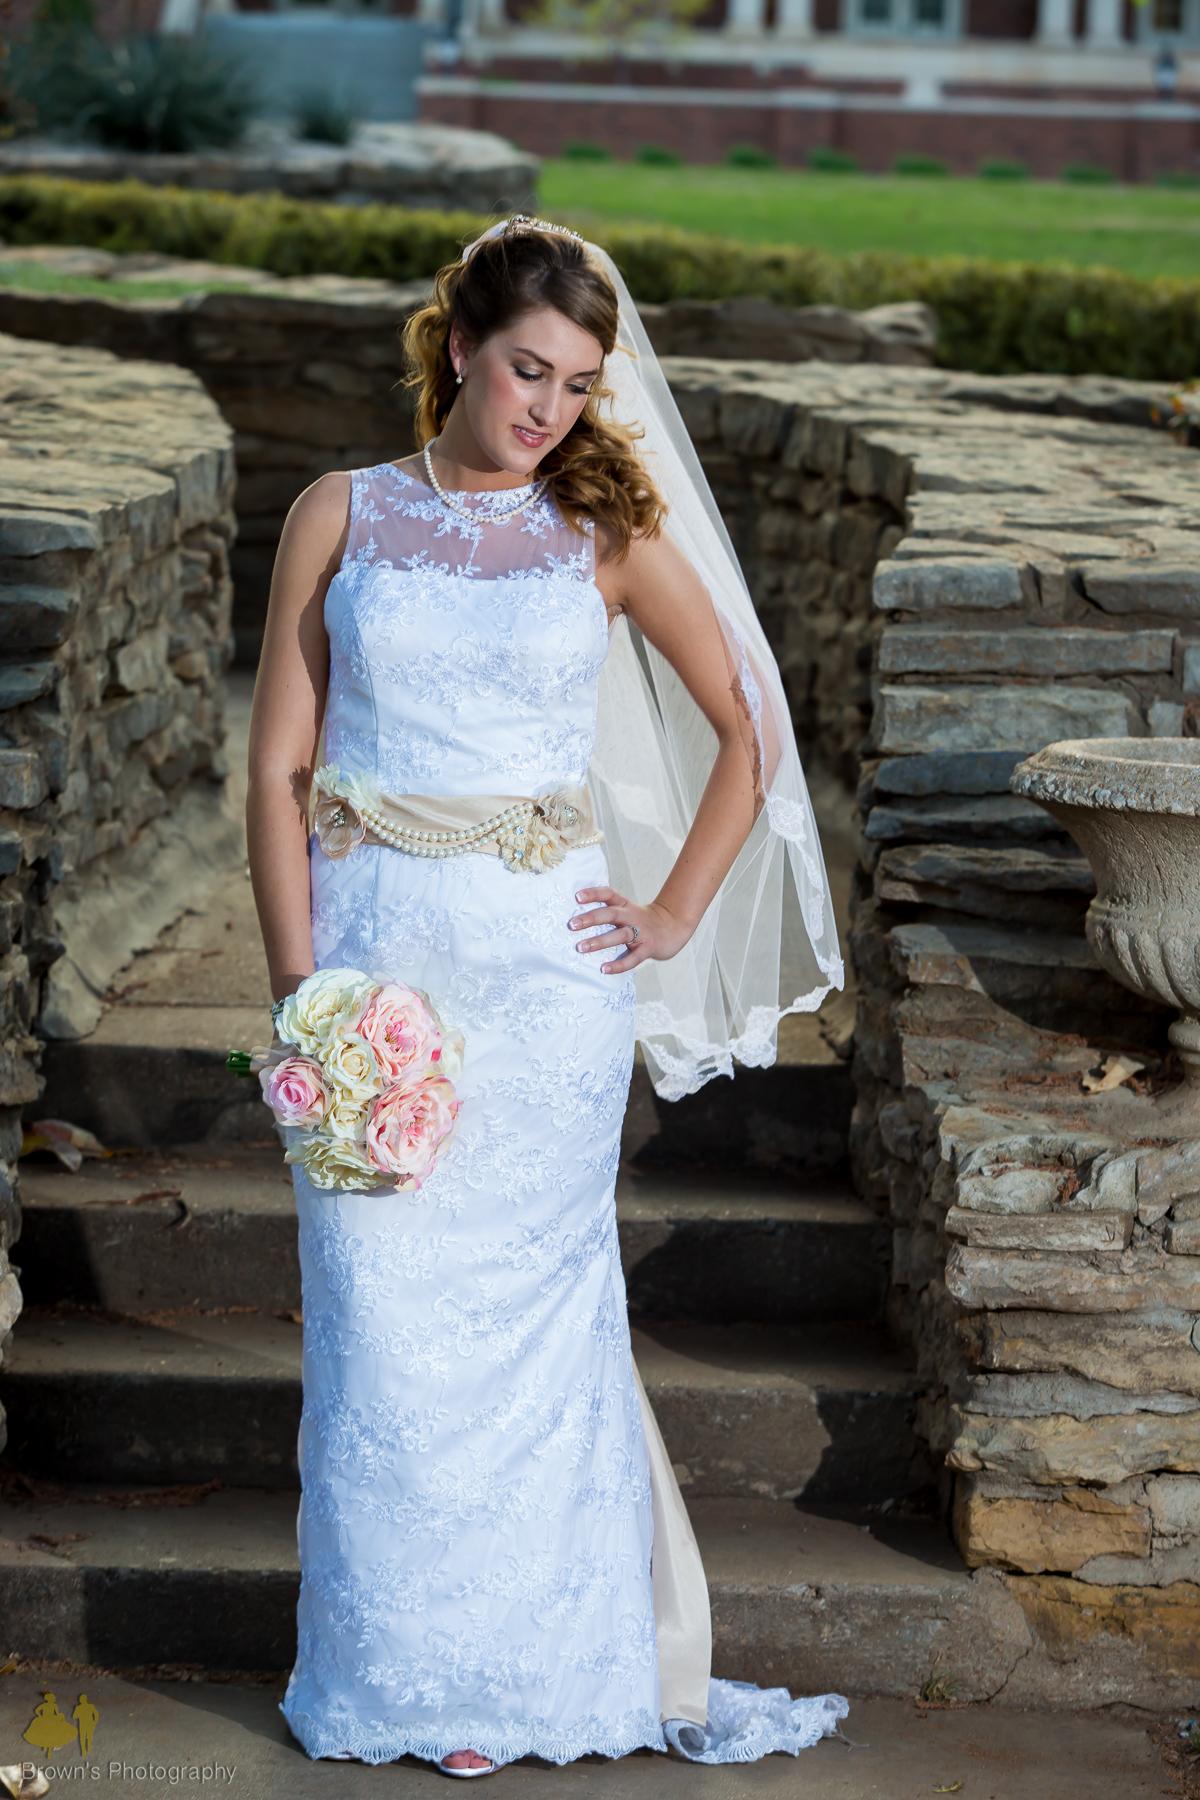 stillwater-wedding-photographer-1-4.jpg